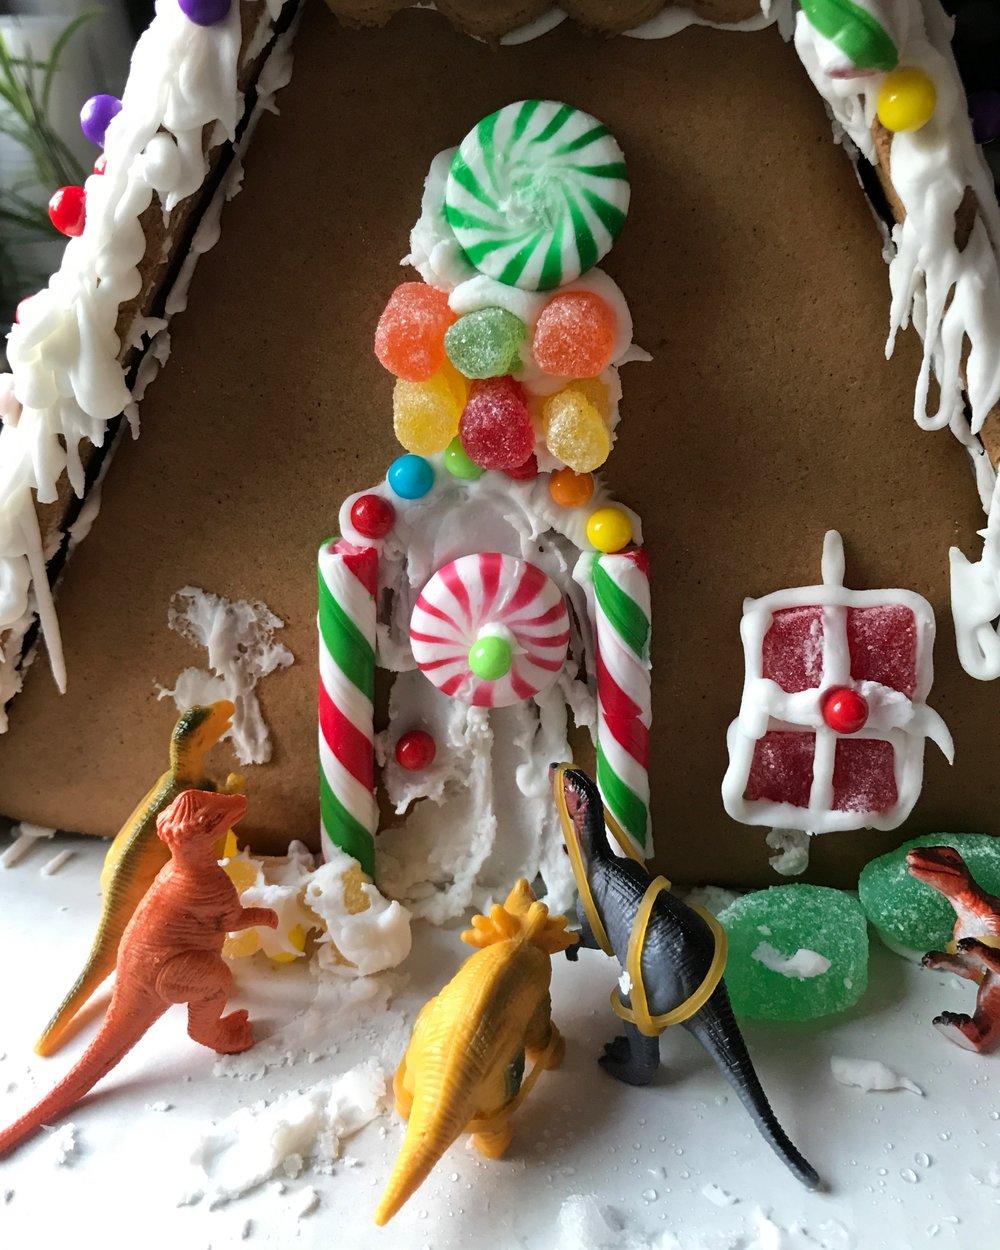 Dinsosaur Gingerbread House | TetherAndFly.com